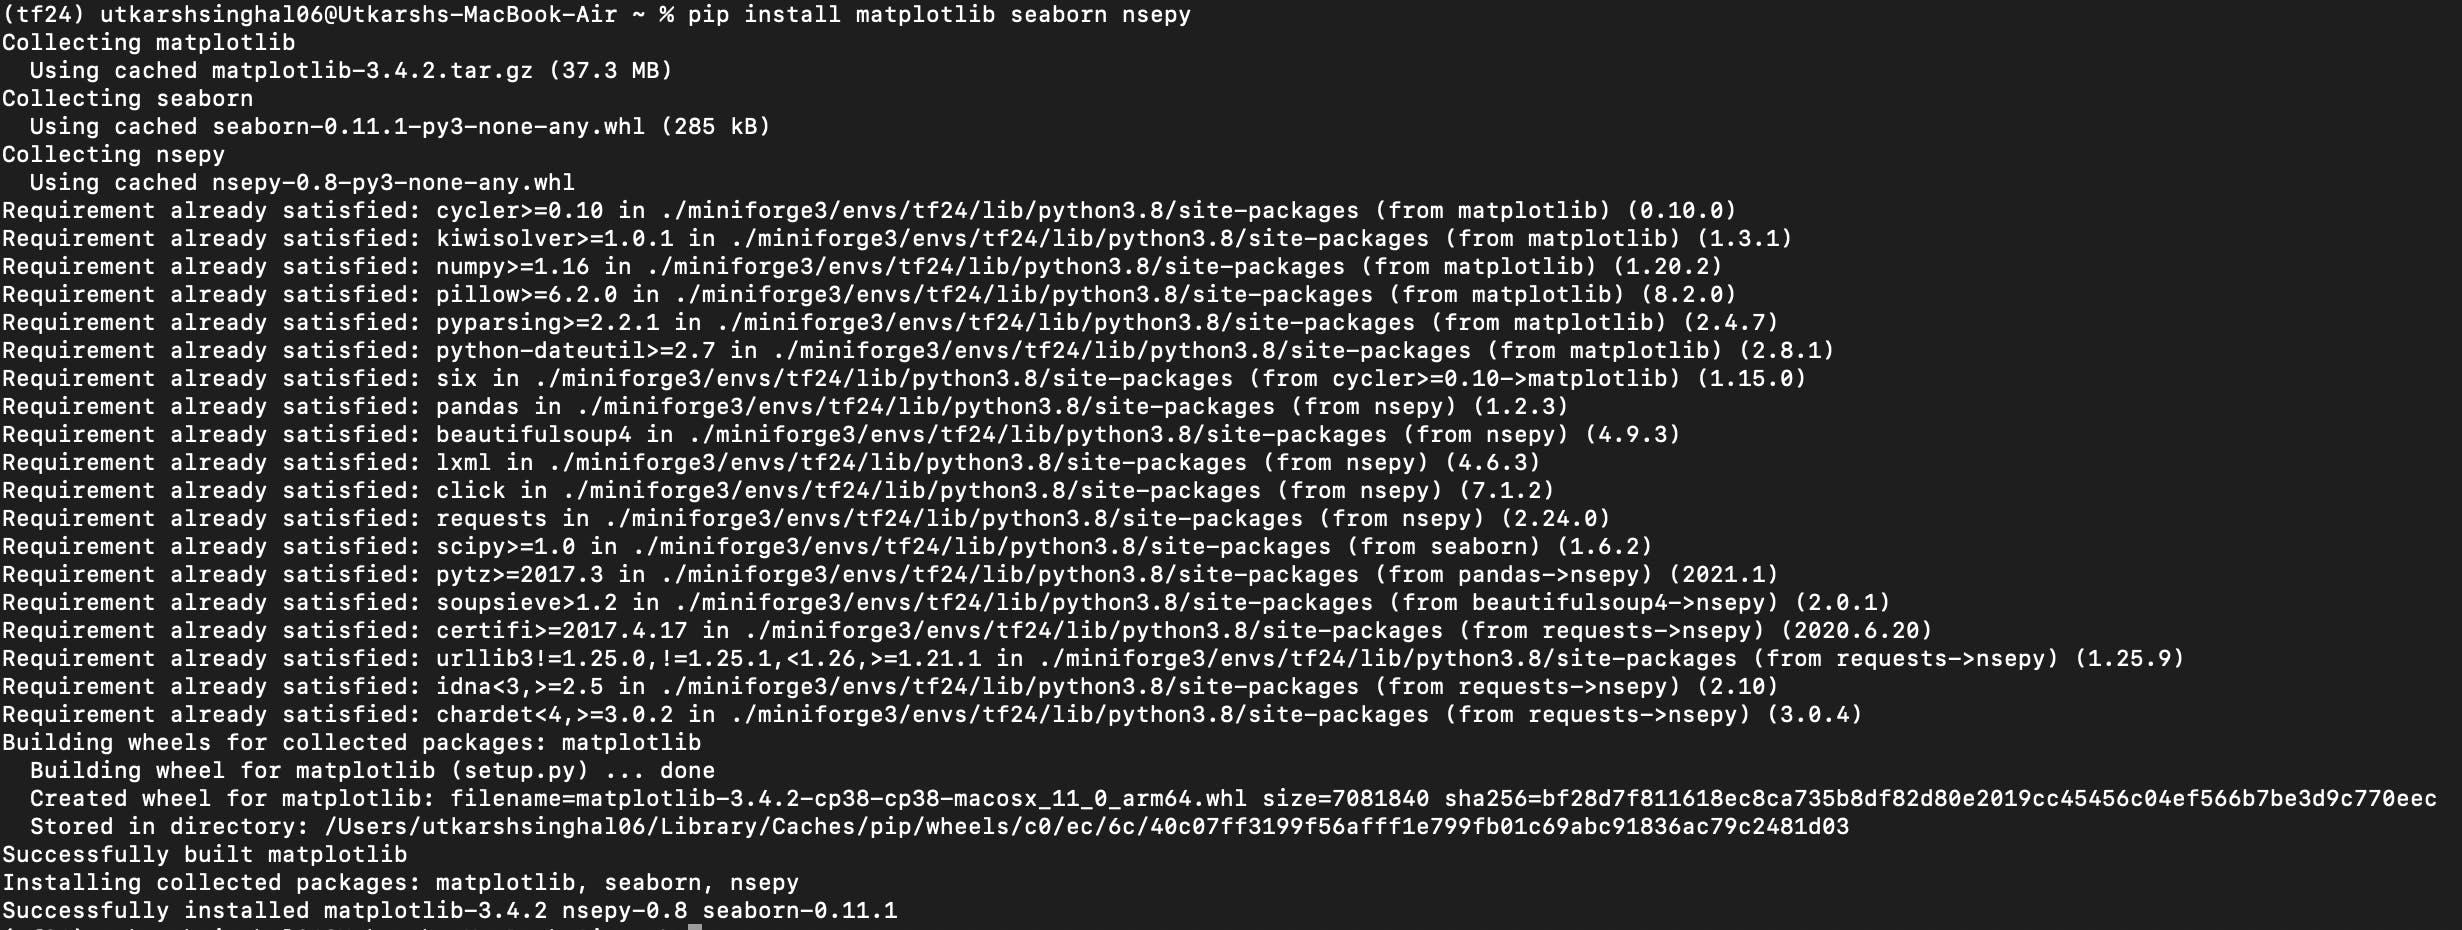 Screenshot 2021-07-05 at 1.31.57 PM.png